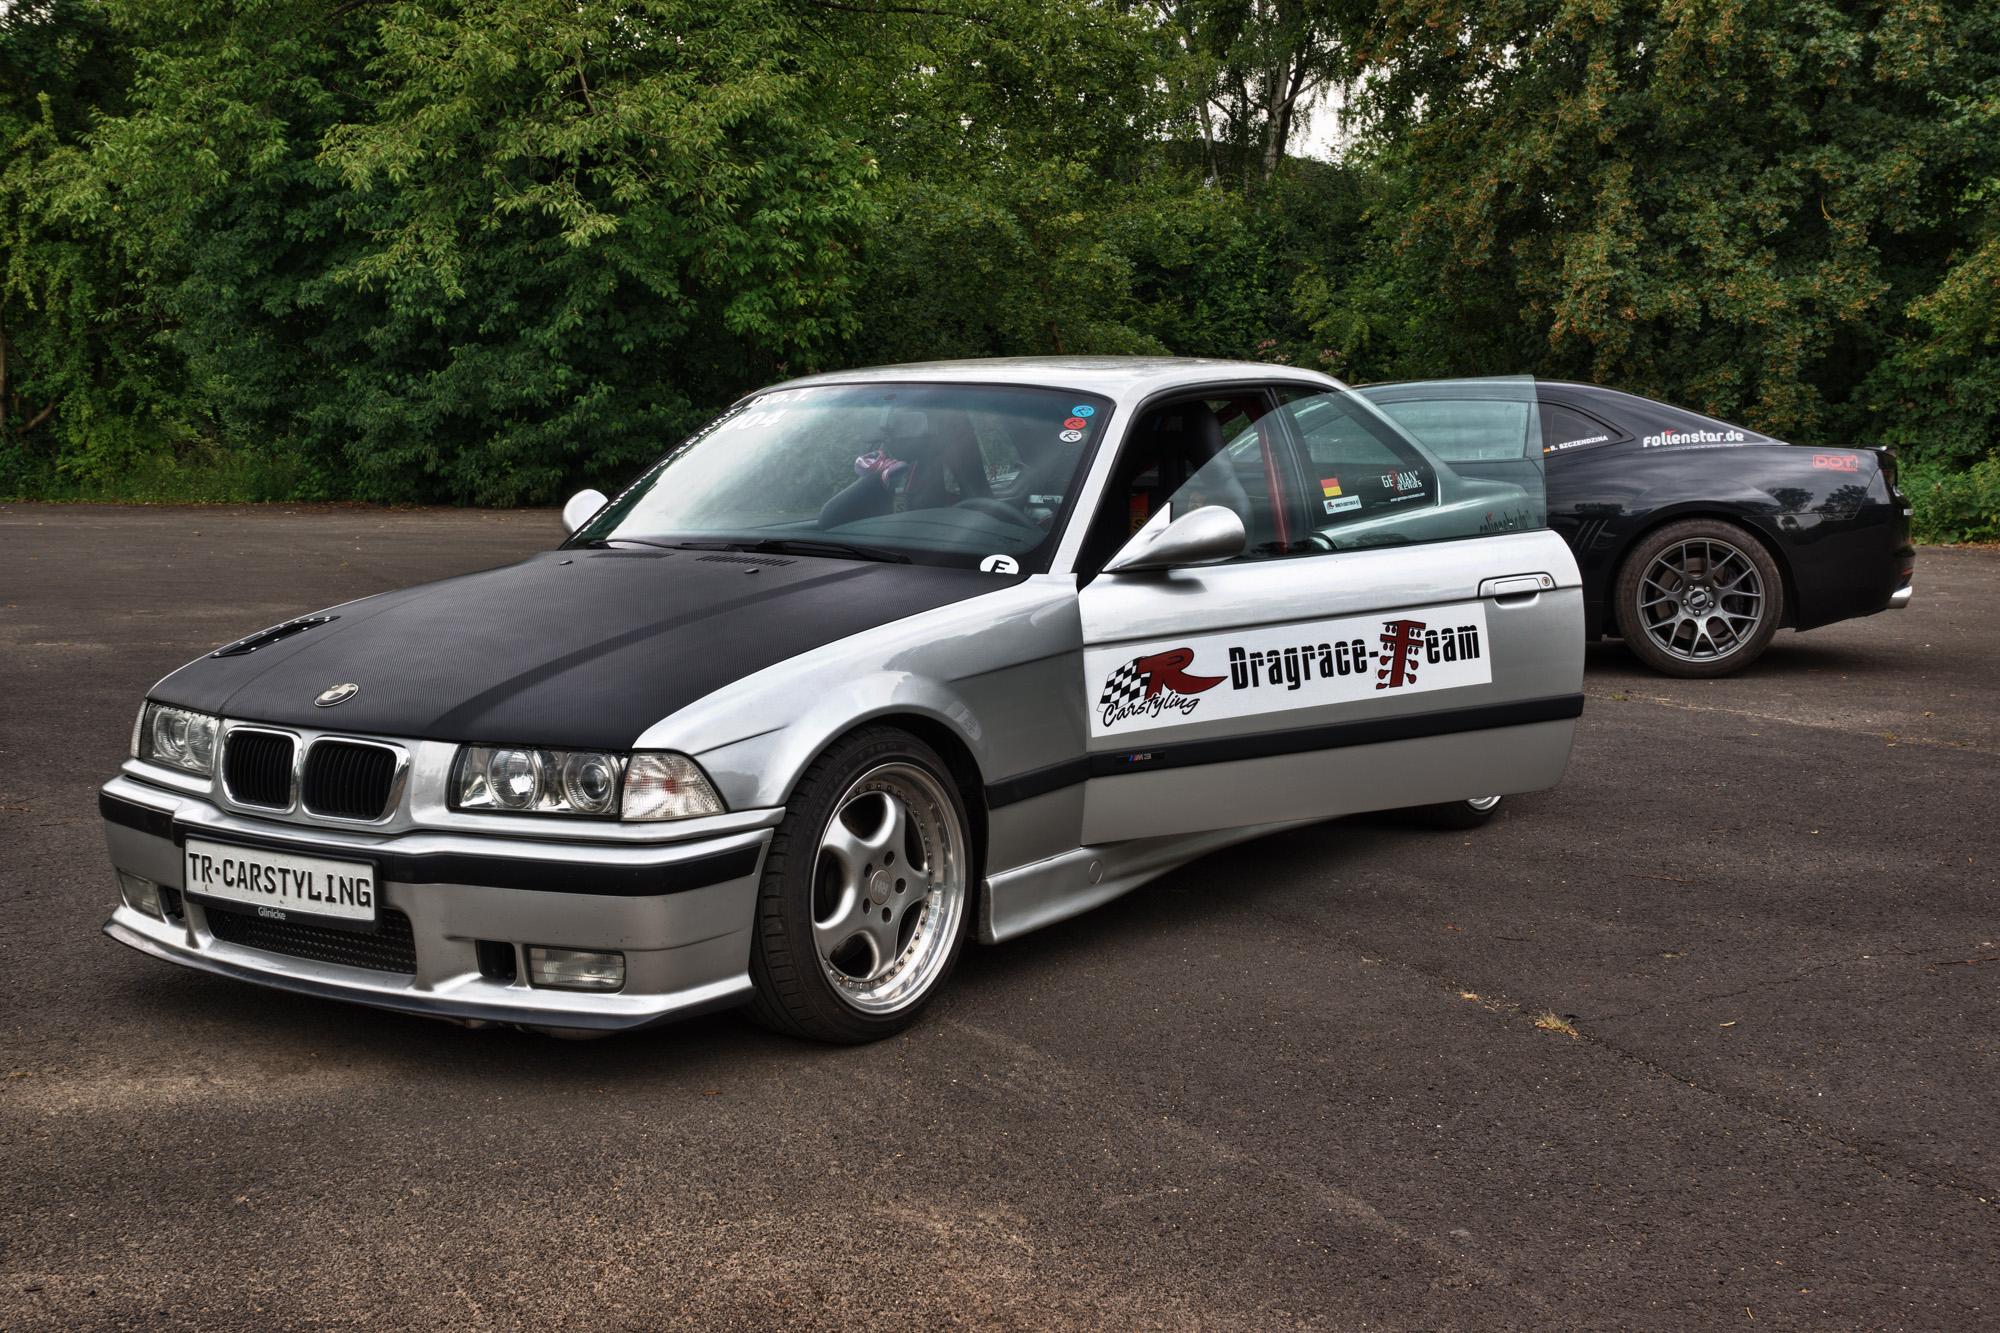 bmw-m3-e36-turbo-tr-carstyling-02